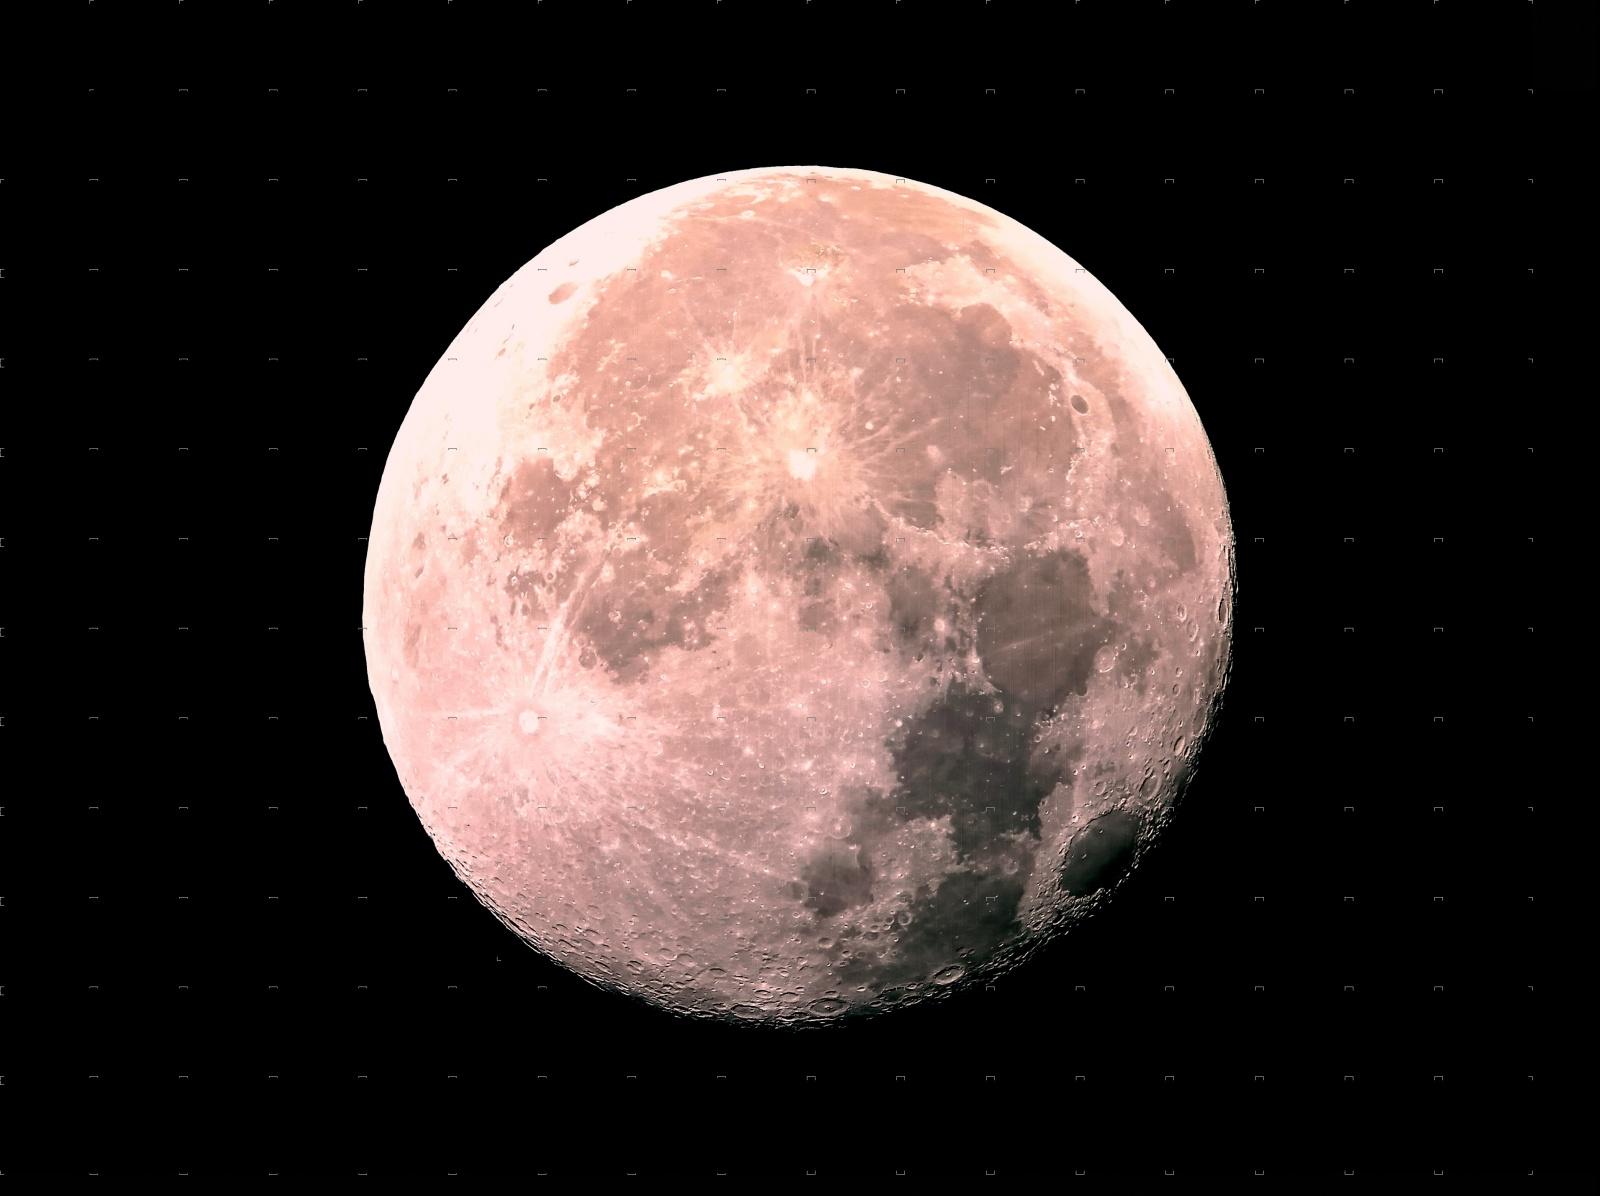 Moon_afokal_4xtiff.thumb.jpg.620011cb6ed69fddfded62a01fd1ff45.jpg